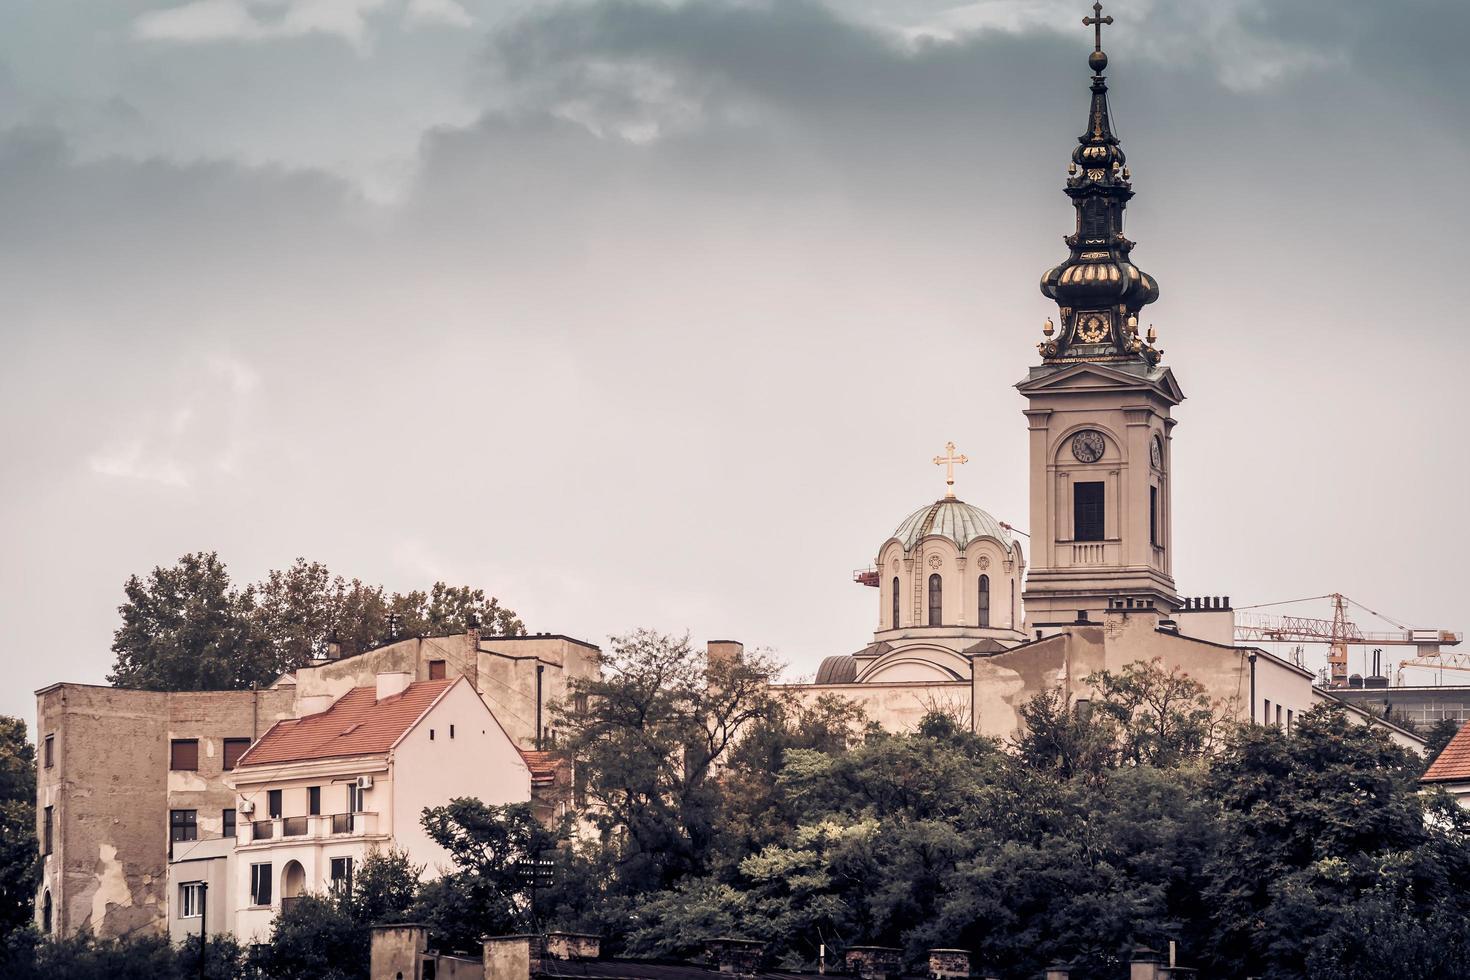 Belgrado, Servië 2015 - Uitzicht op Stari Grad en St. michael's kathedraal foto